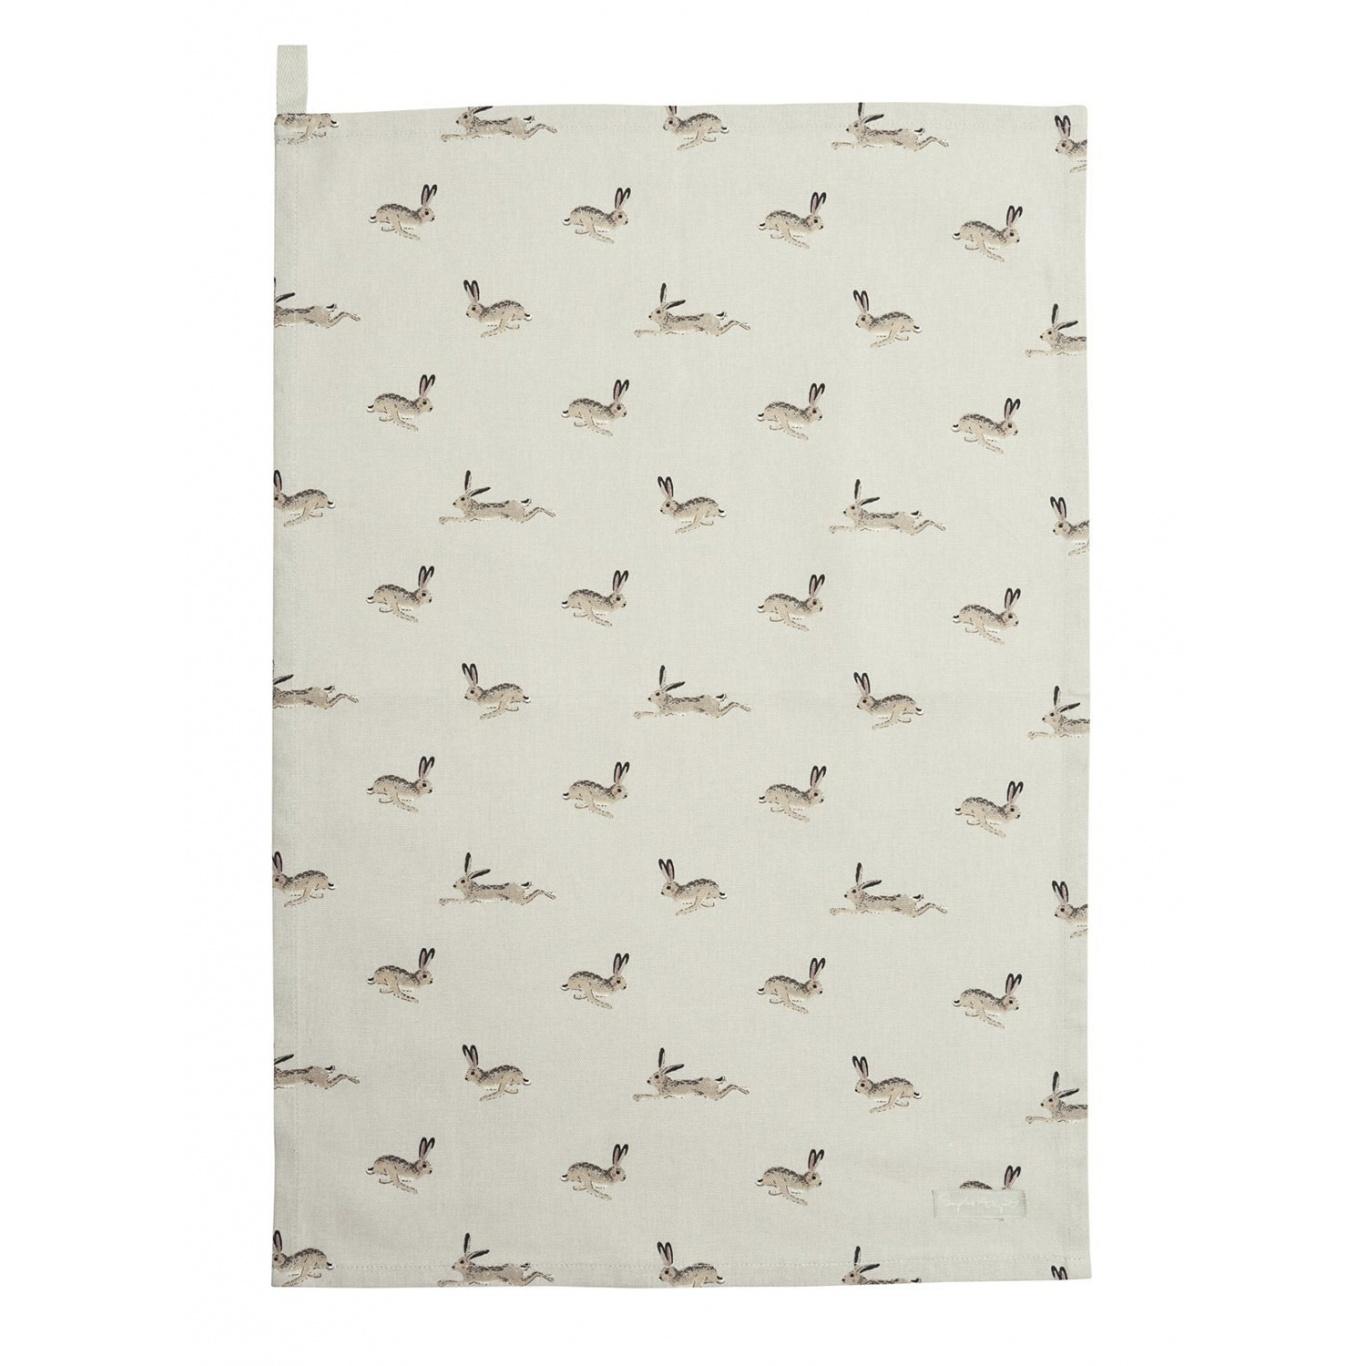 Image of Sophie Allport Hare Tea Towel